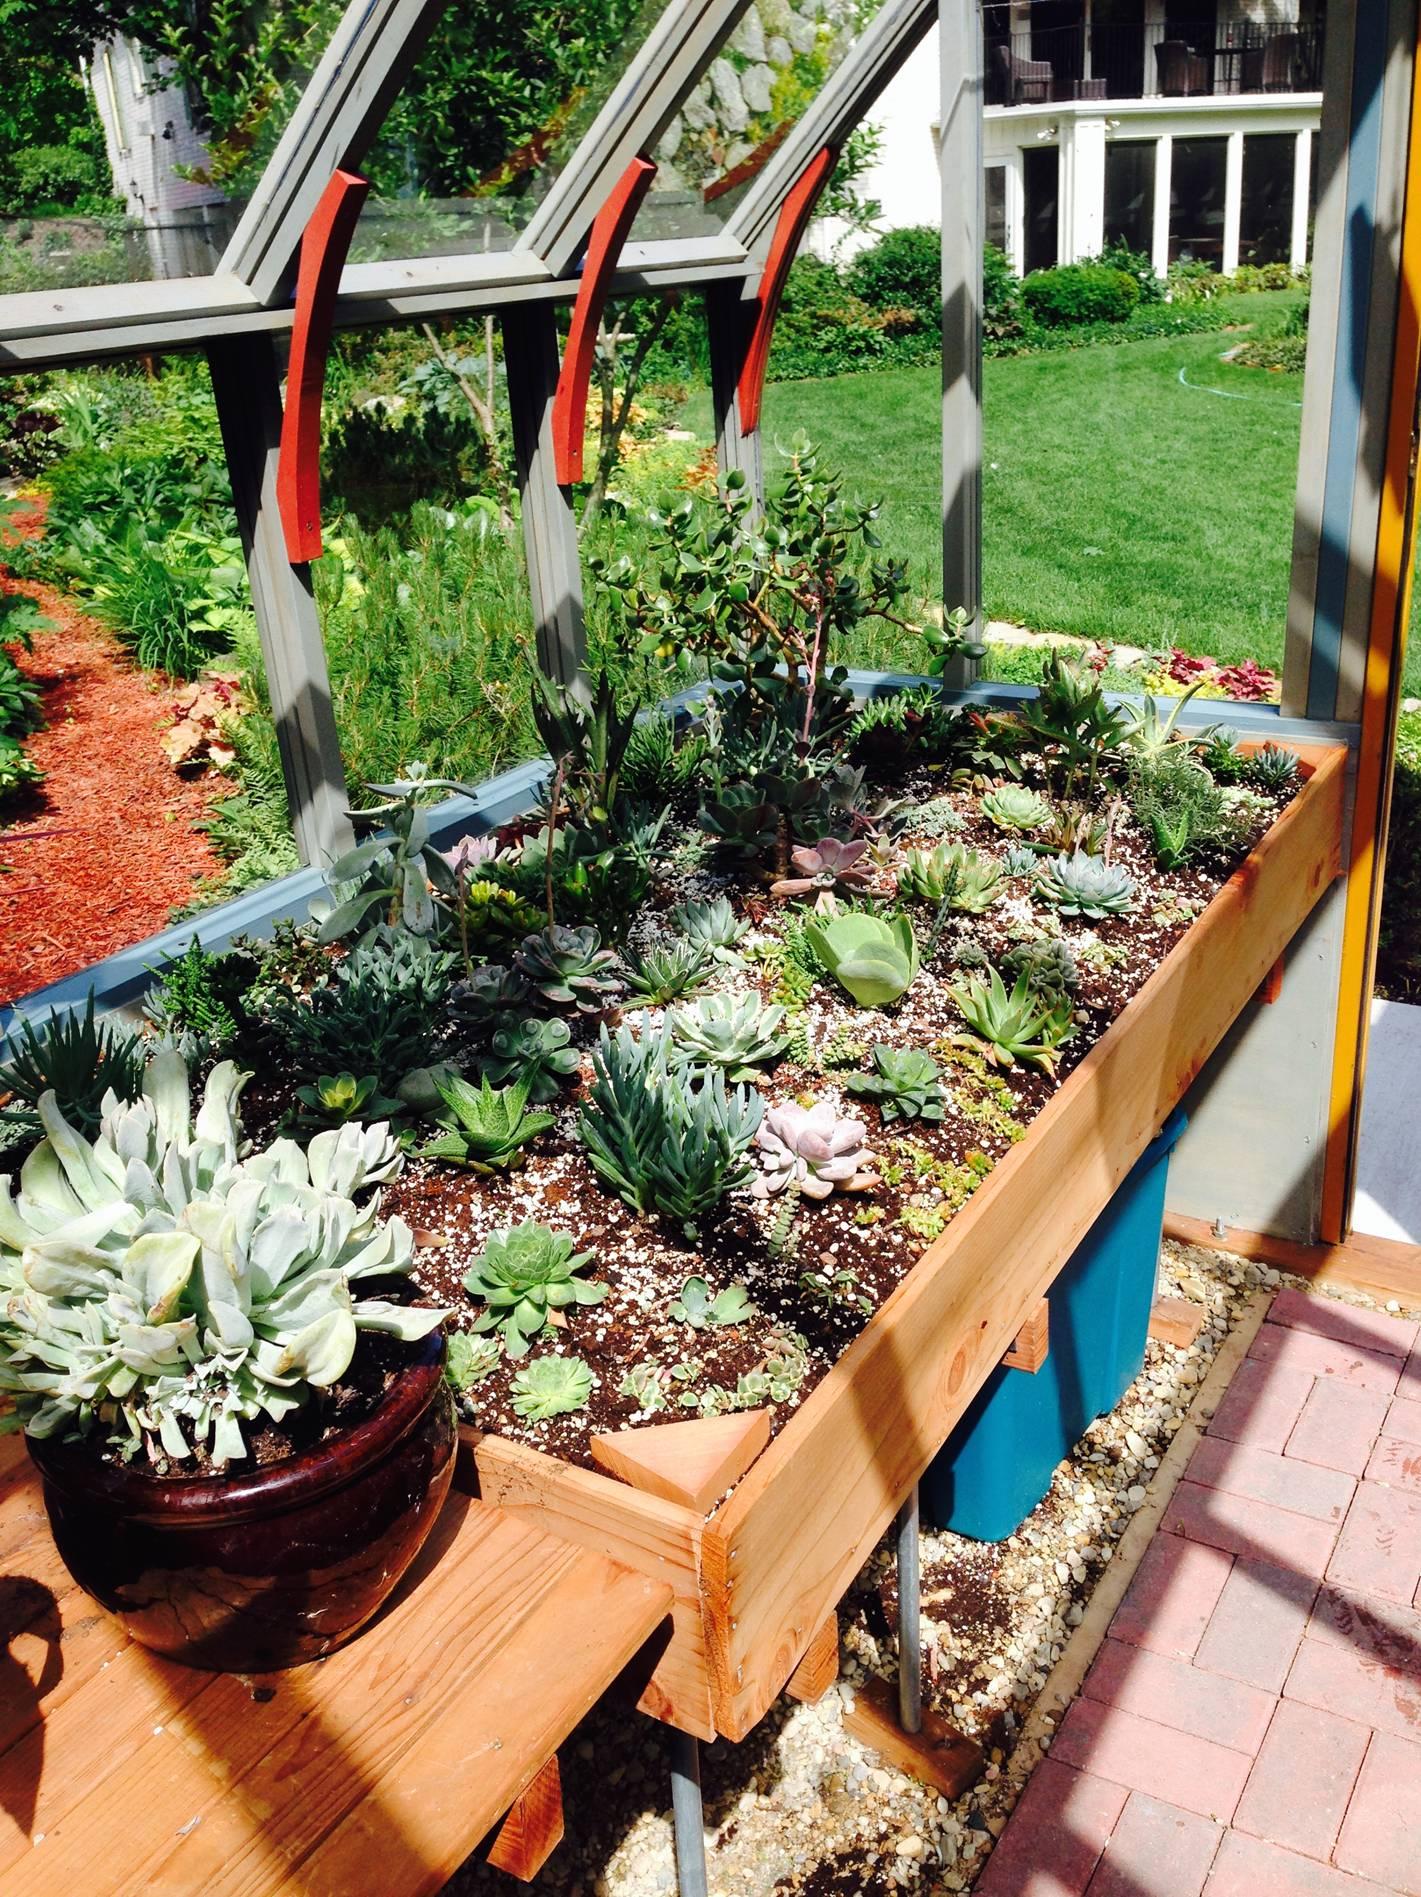 Soil greenhouse bench in Tudor Greenhouse